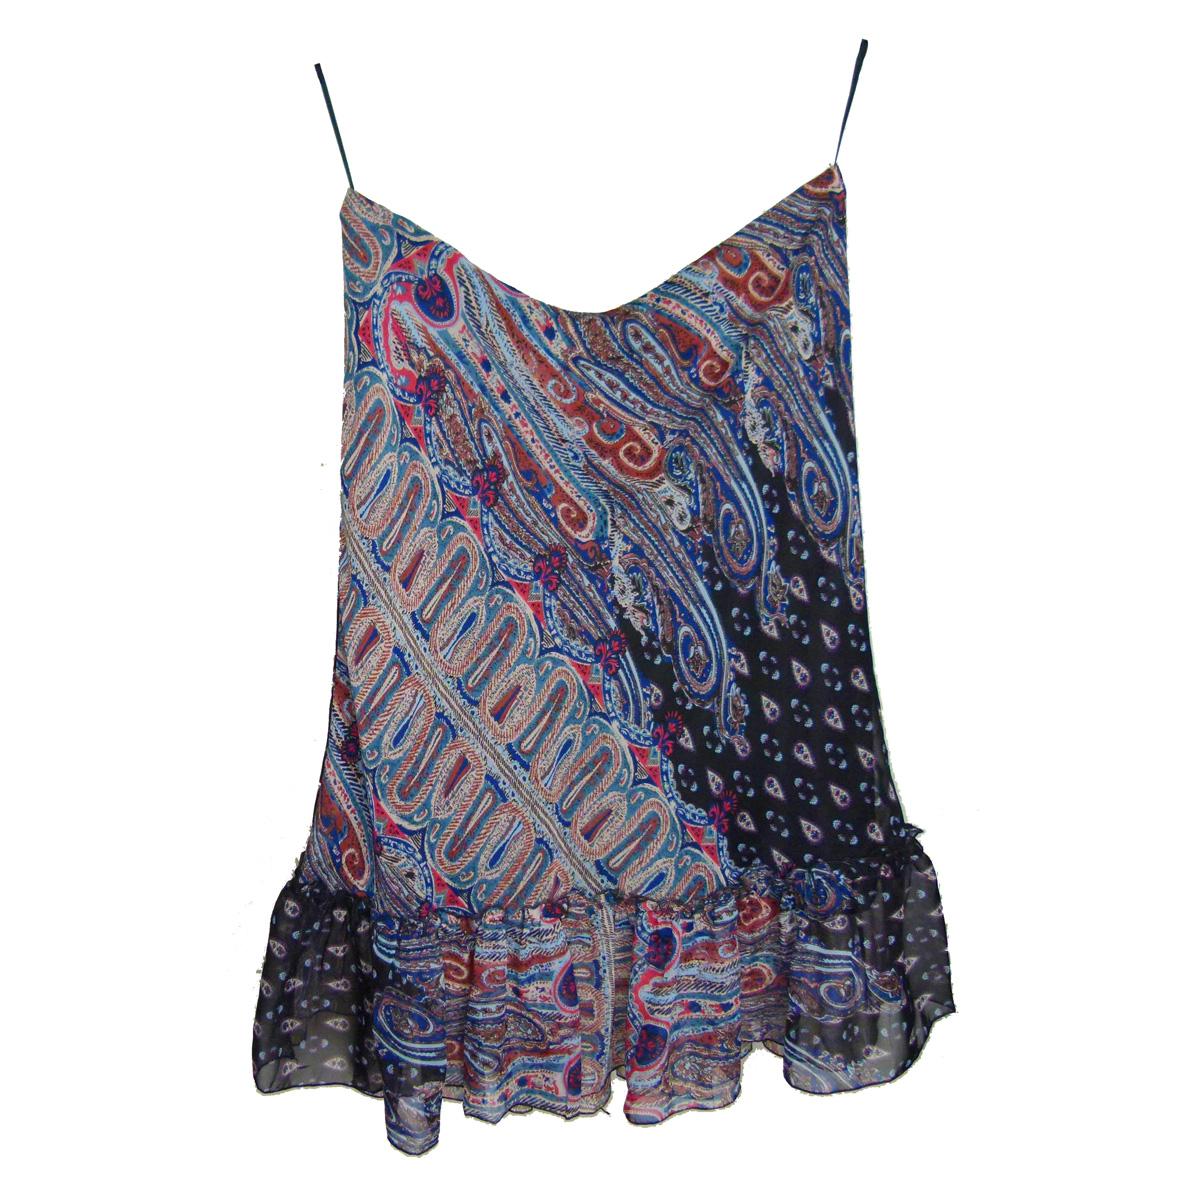 Satin Ruffle Hem Midi Skirt in Blue